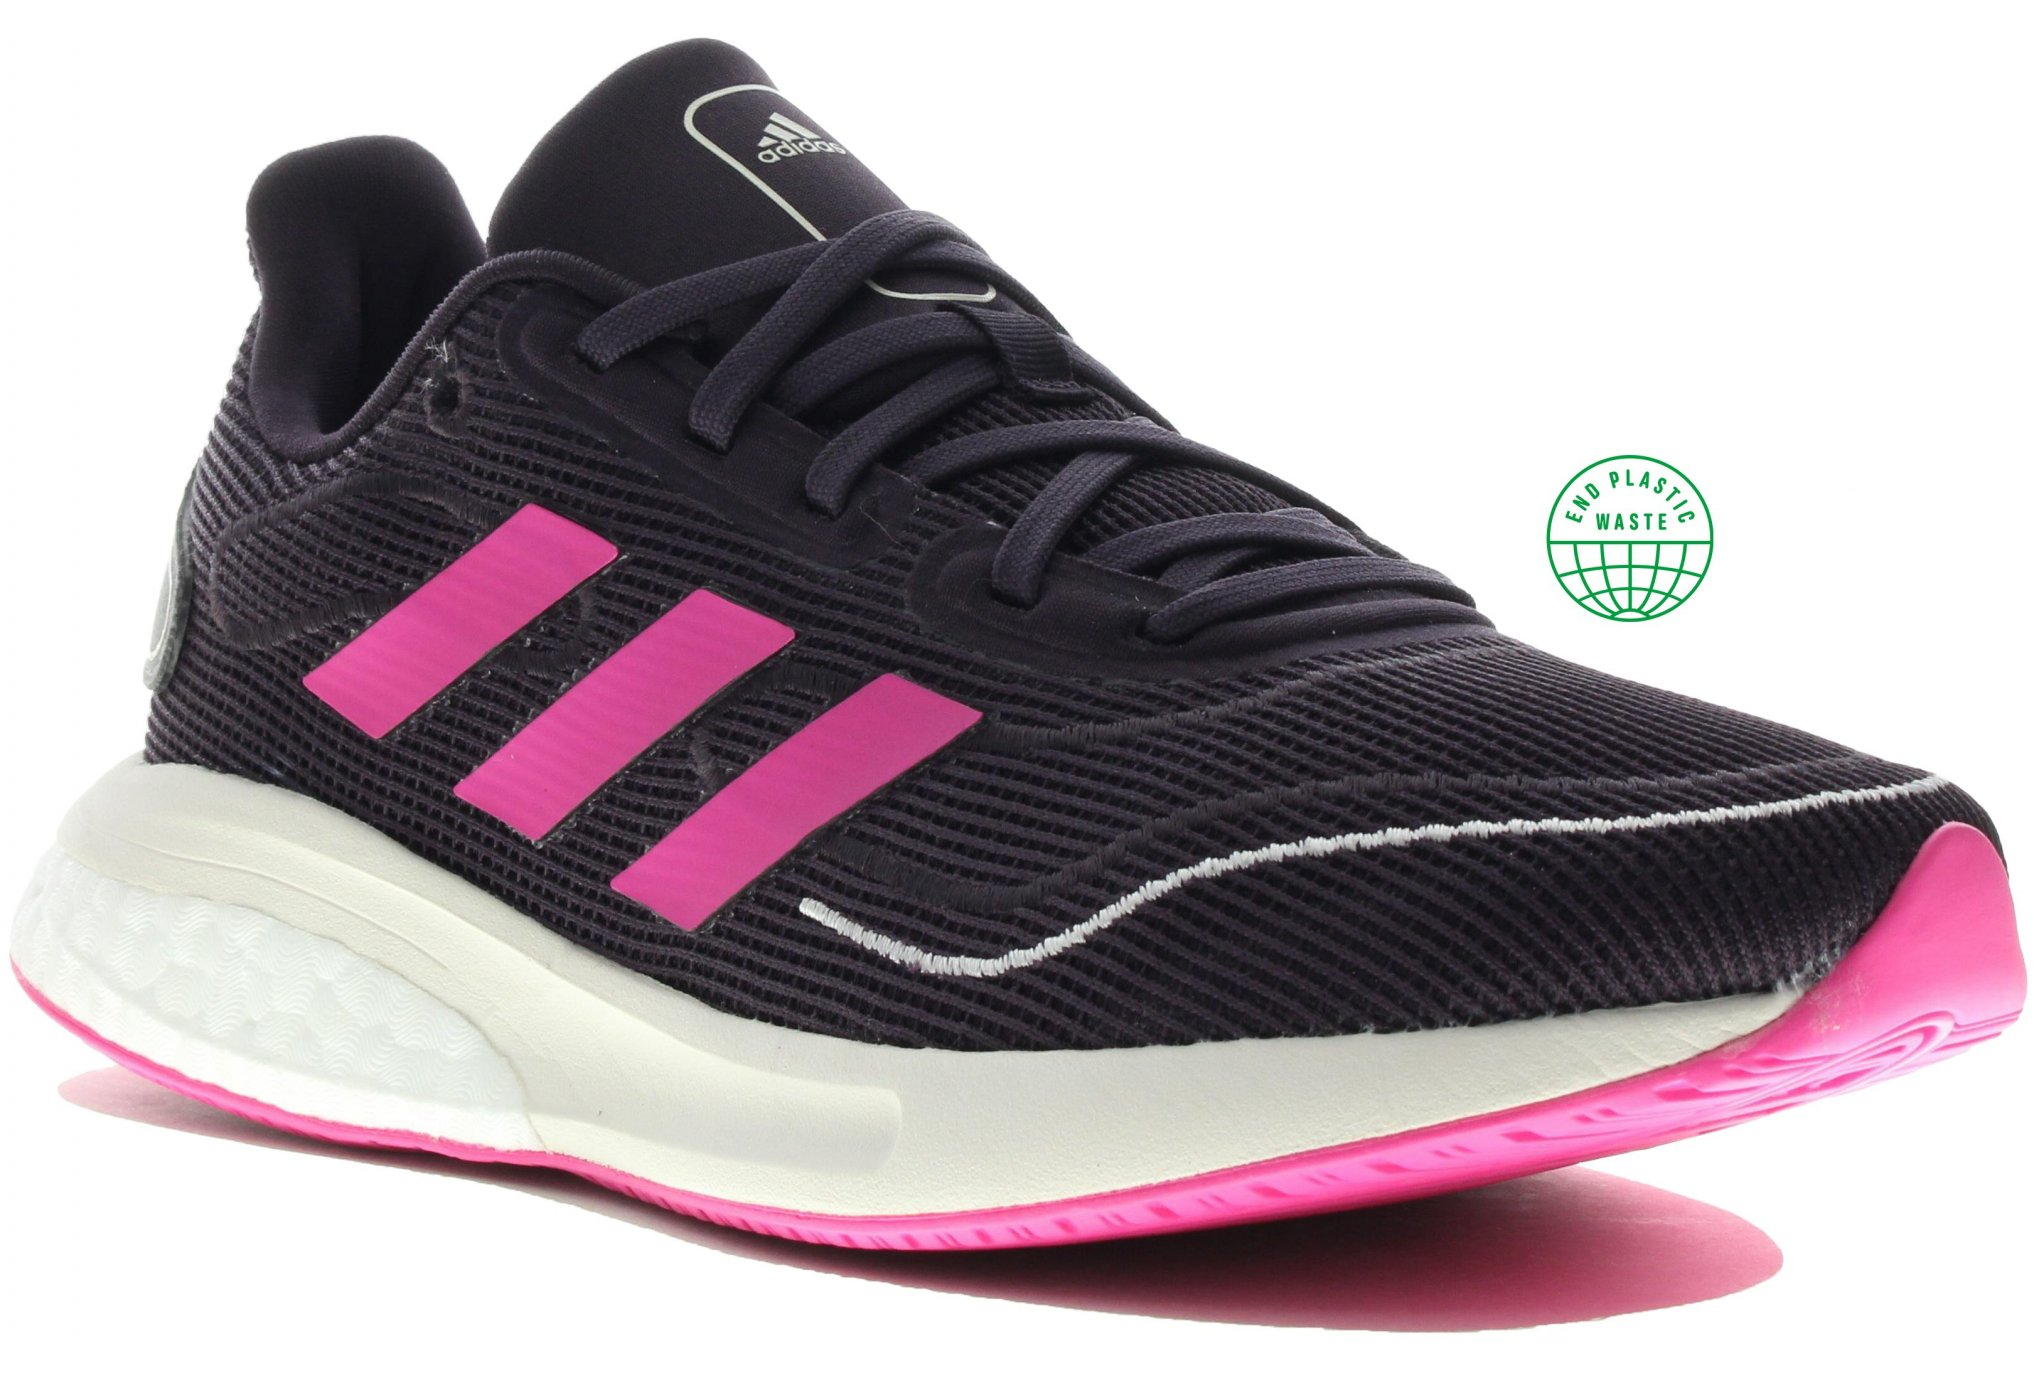 adidas Supernova Primegreen Fille Chaussures running femme